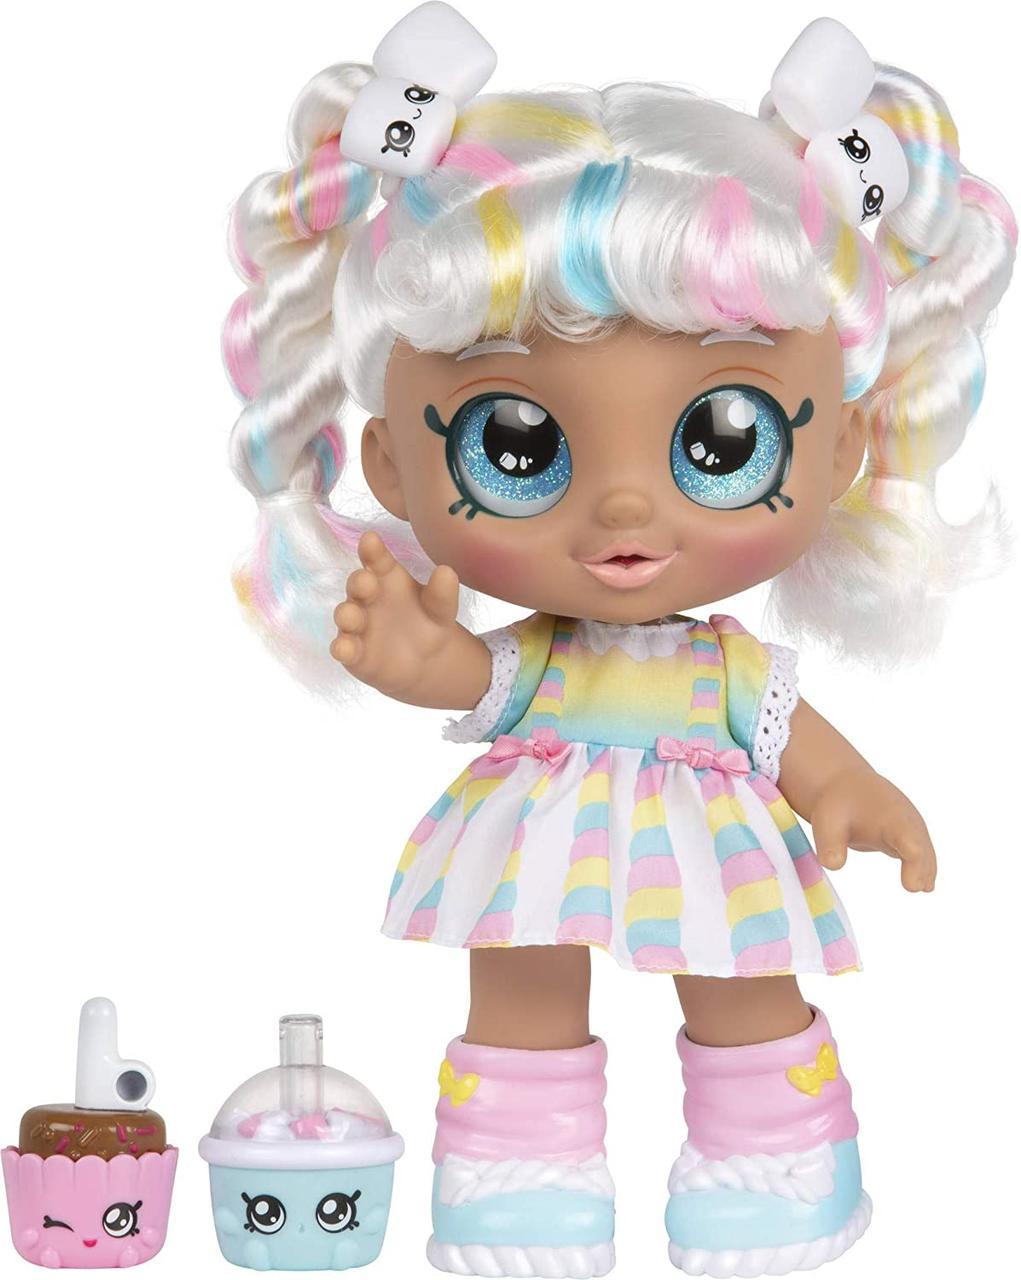 Большая кукла Кинди Кидс Марша Мелло Время друзей перекусить Kindi Kids Marsha Mello Snack Time Friends 5009